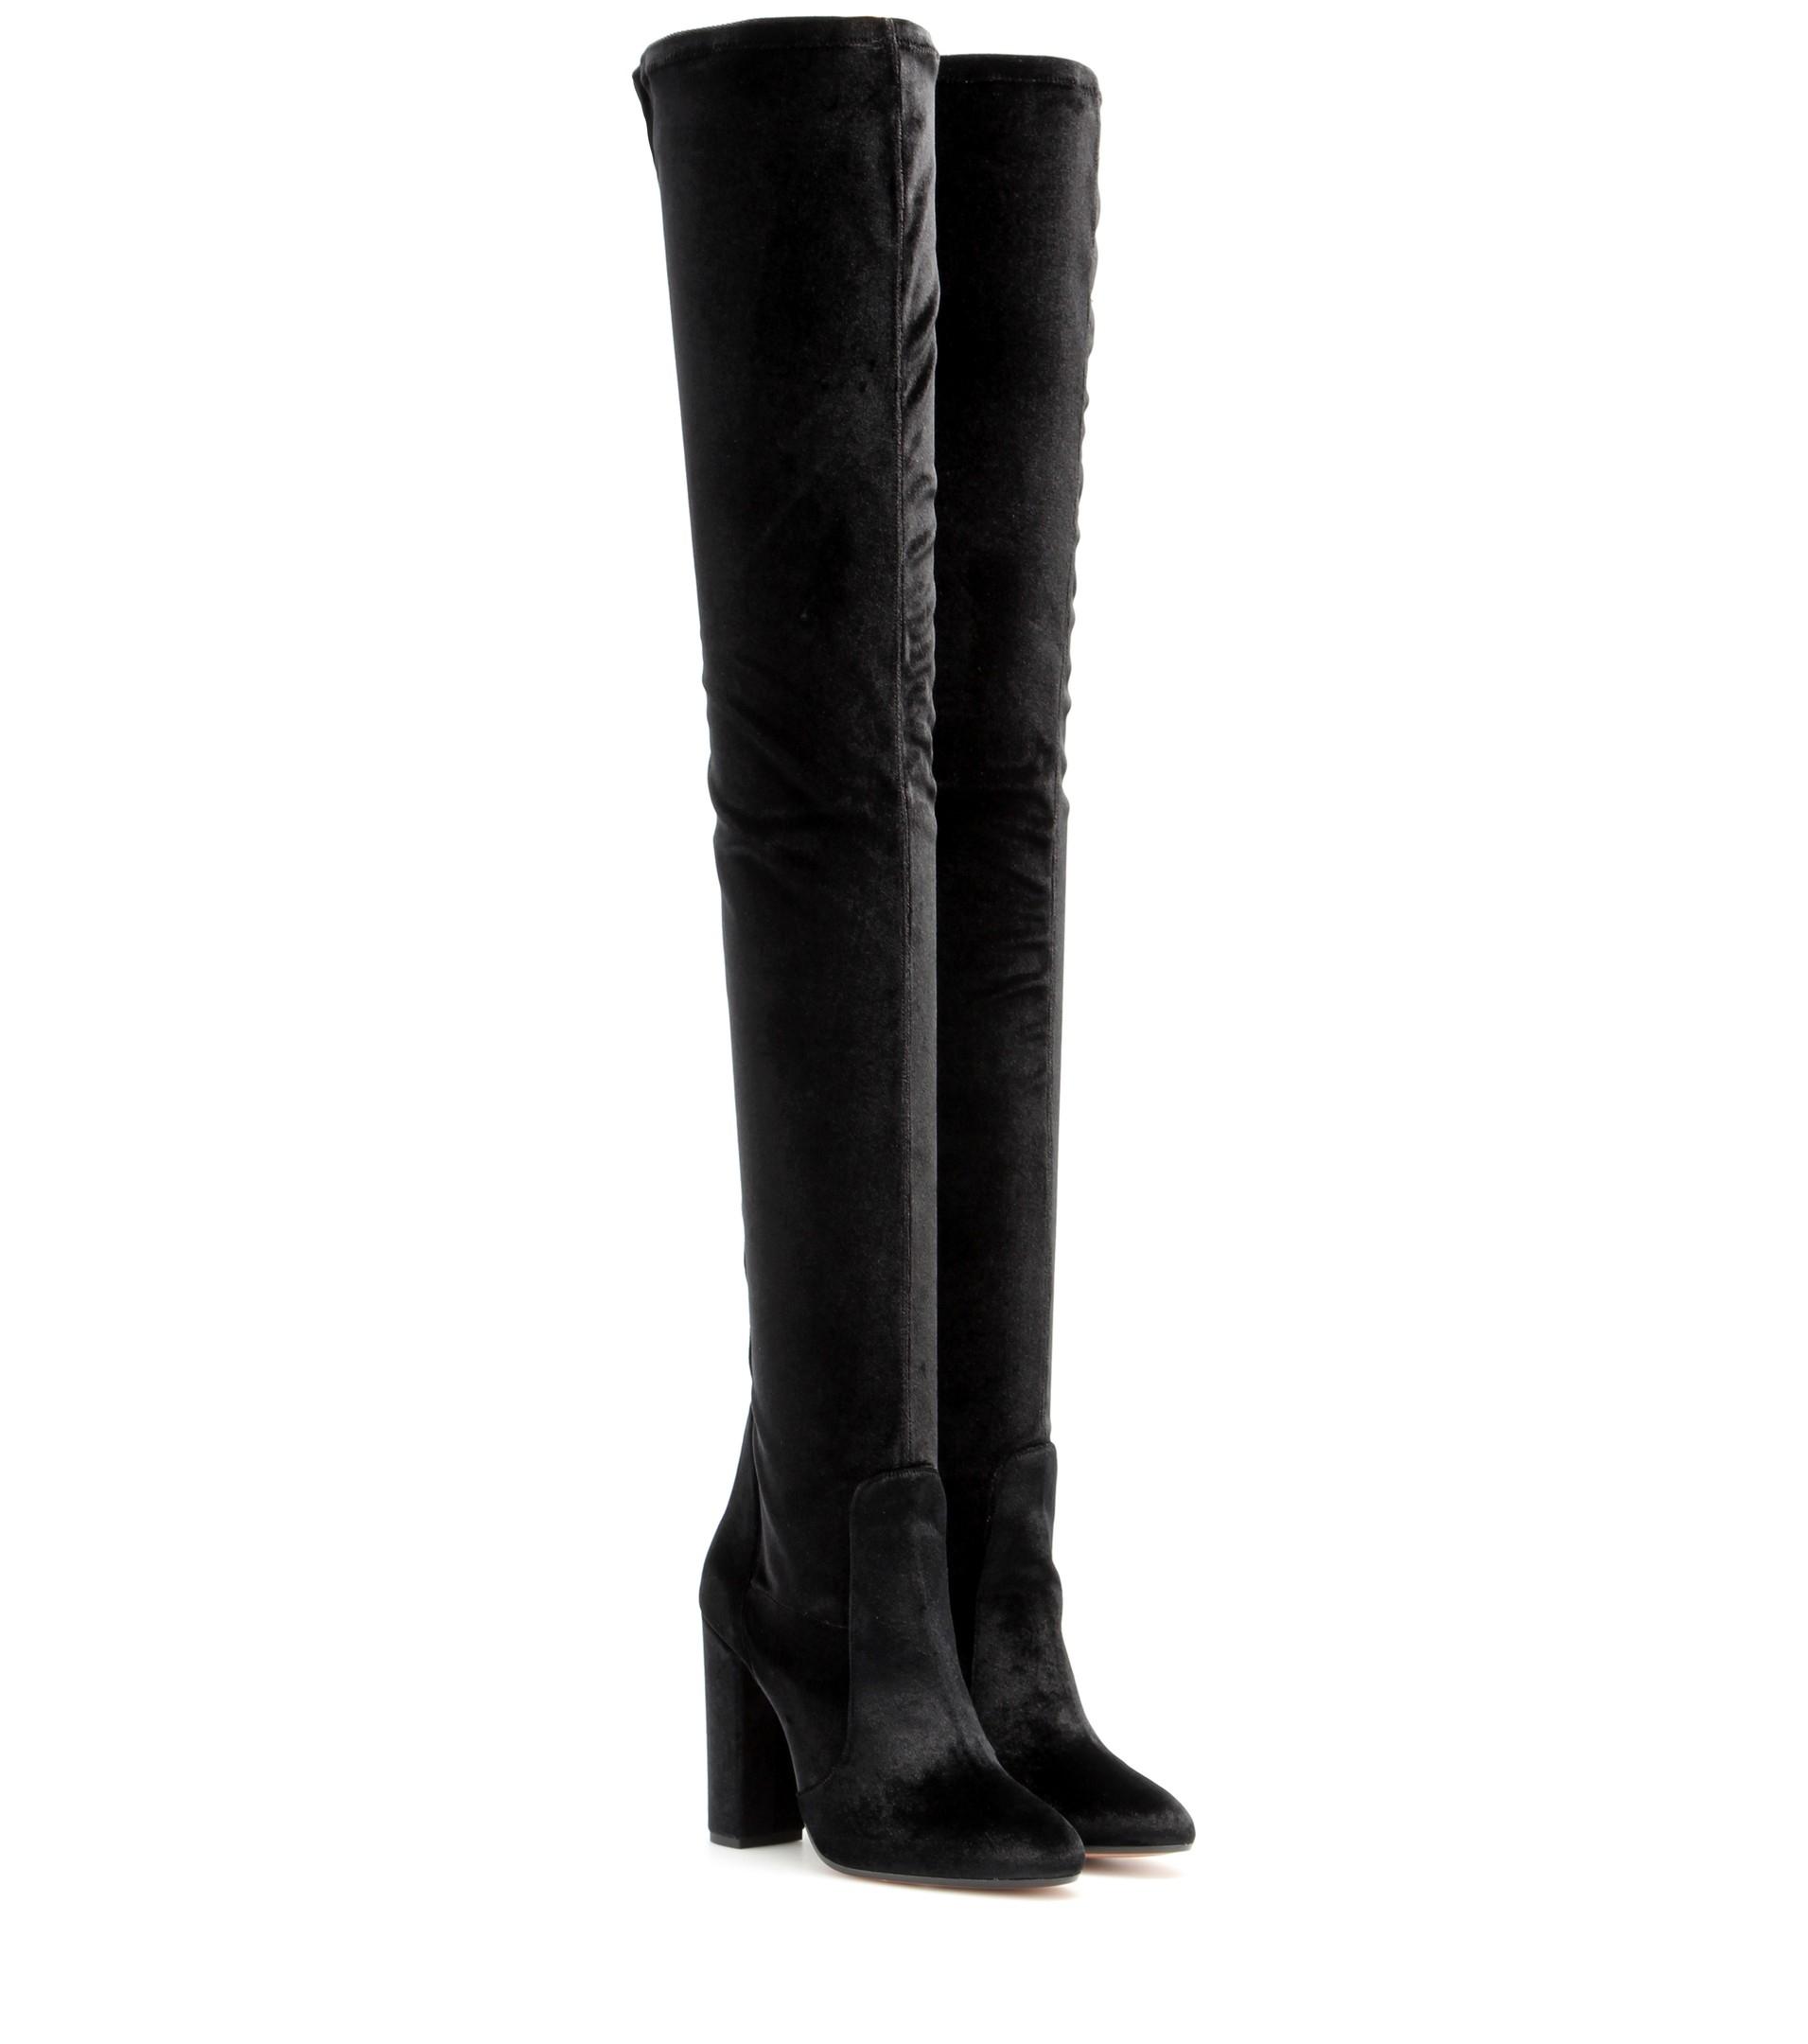 109d32f734c Lyst - Aquazzura Velvet Over-The-Knee Boots in Black